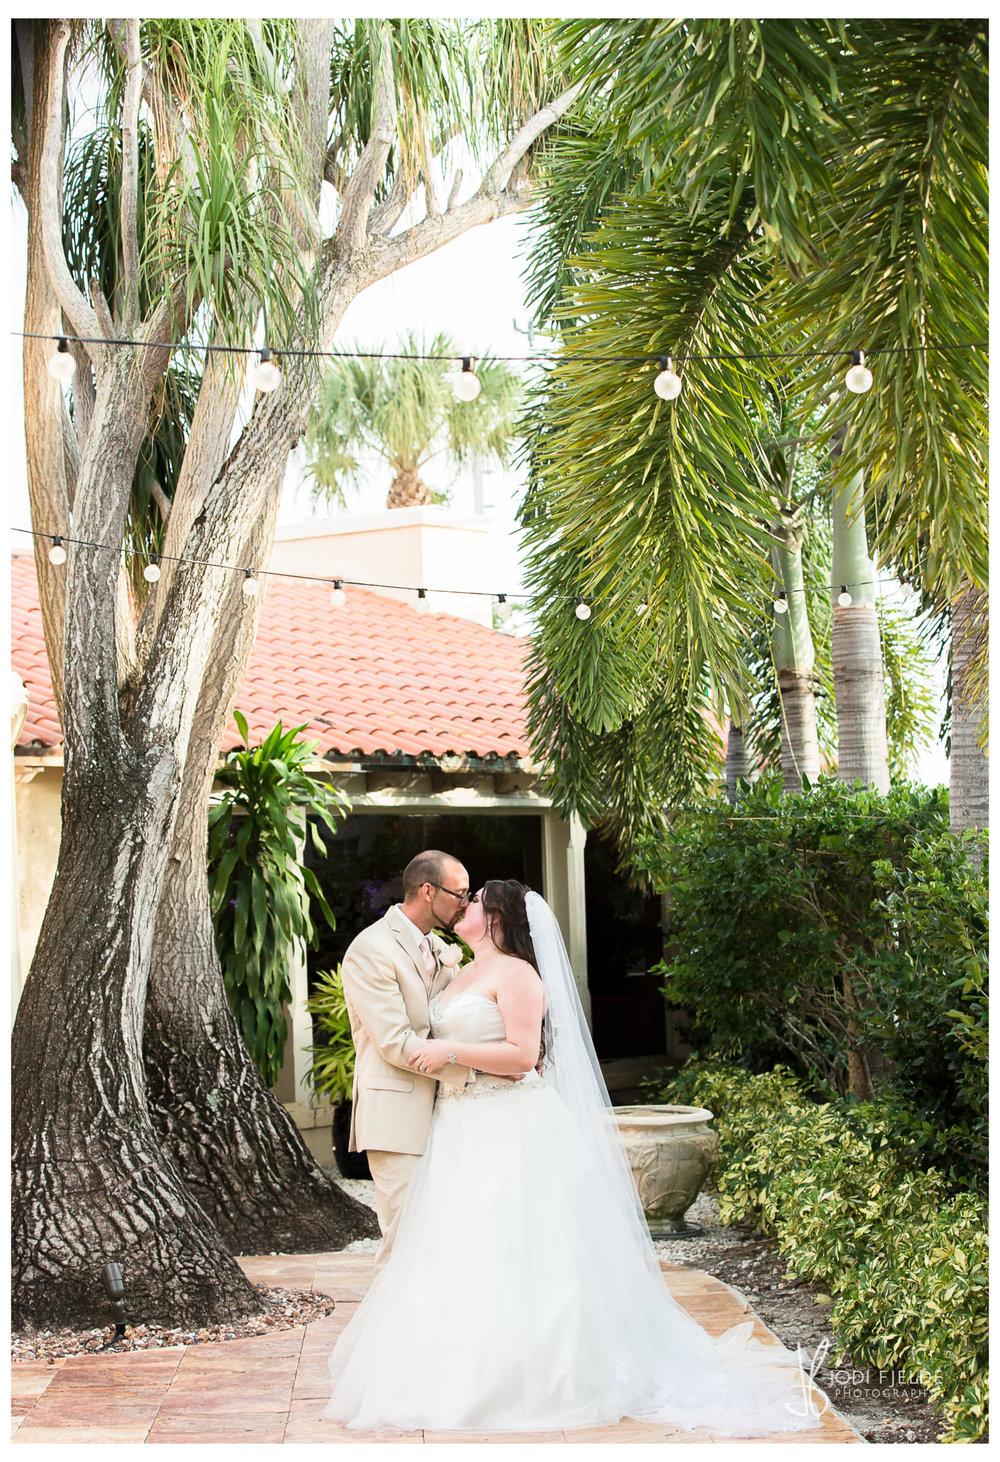 Benvenuto_Boynton Beach_ Wedding_Emily_&_Shawn 28.jpg